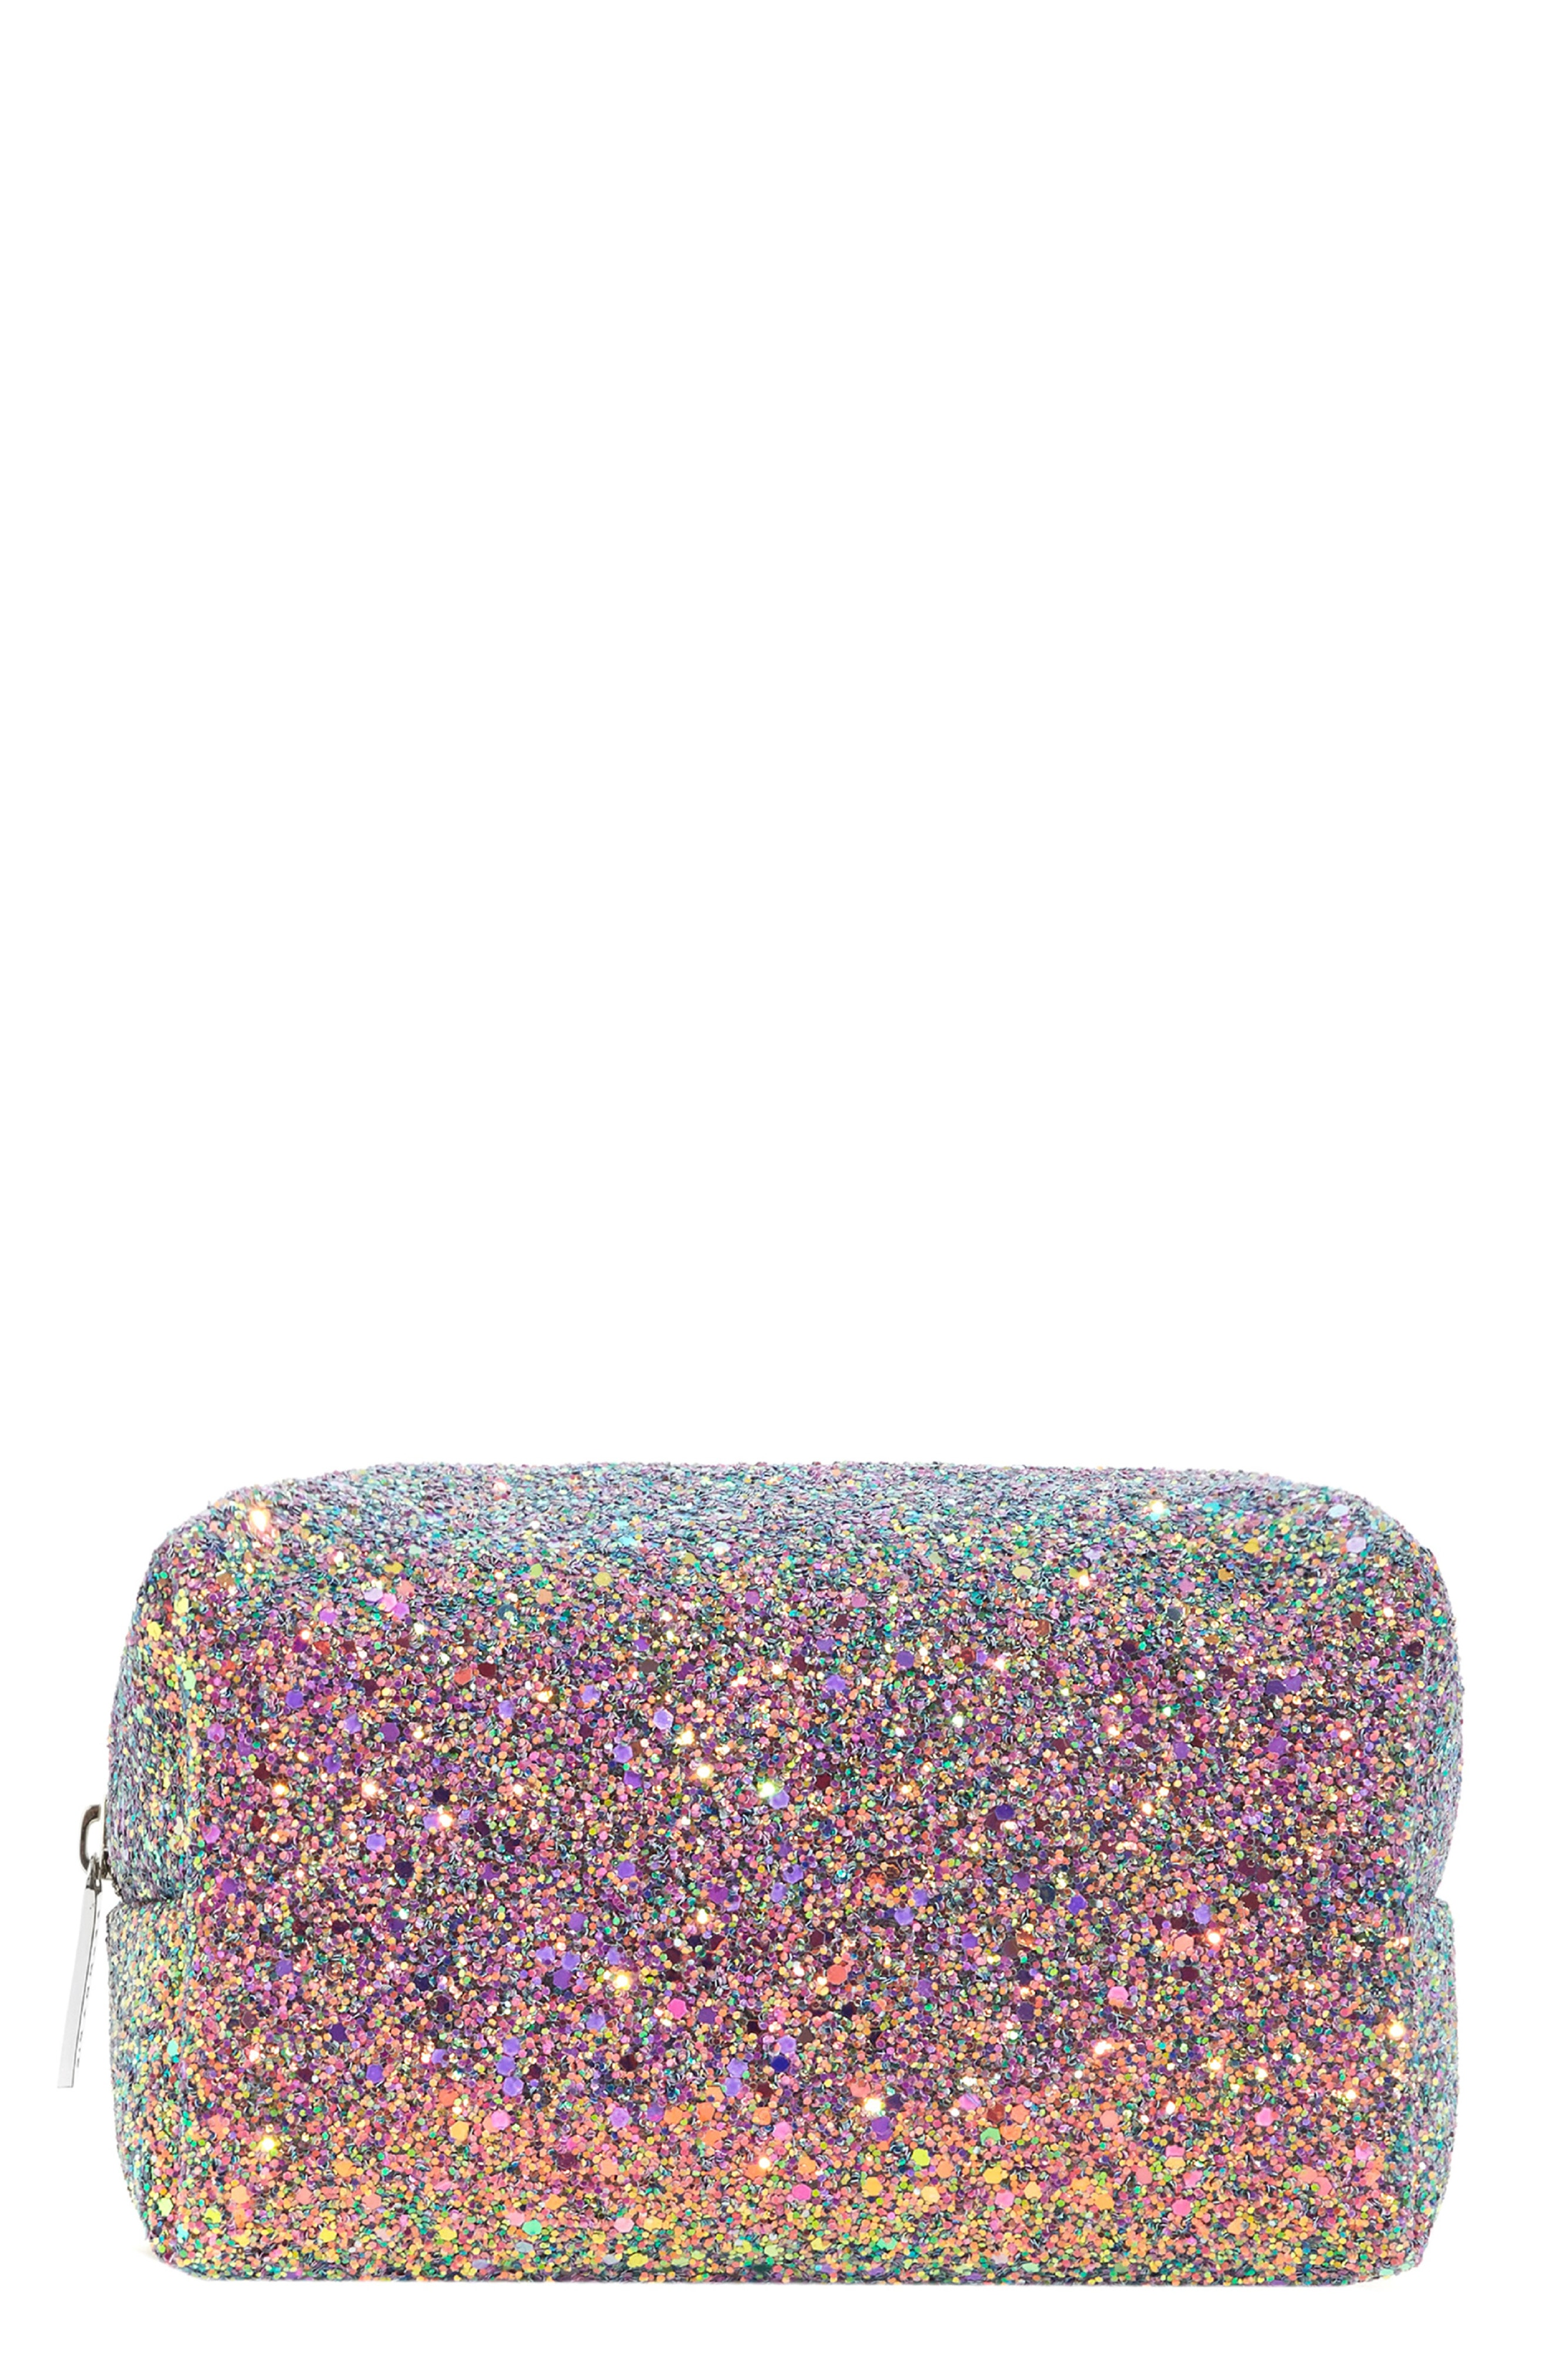 SkinnyDip Purple Glitter Makeup Bag